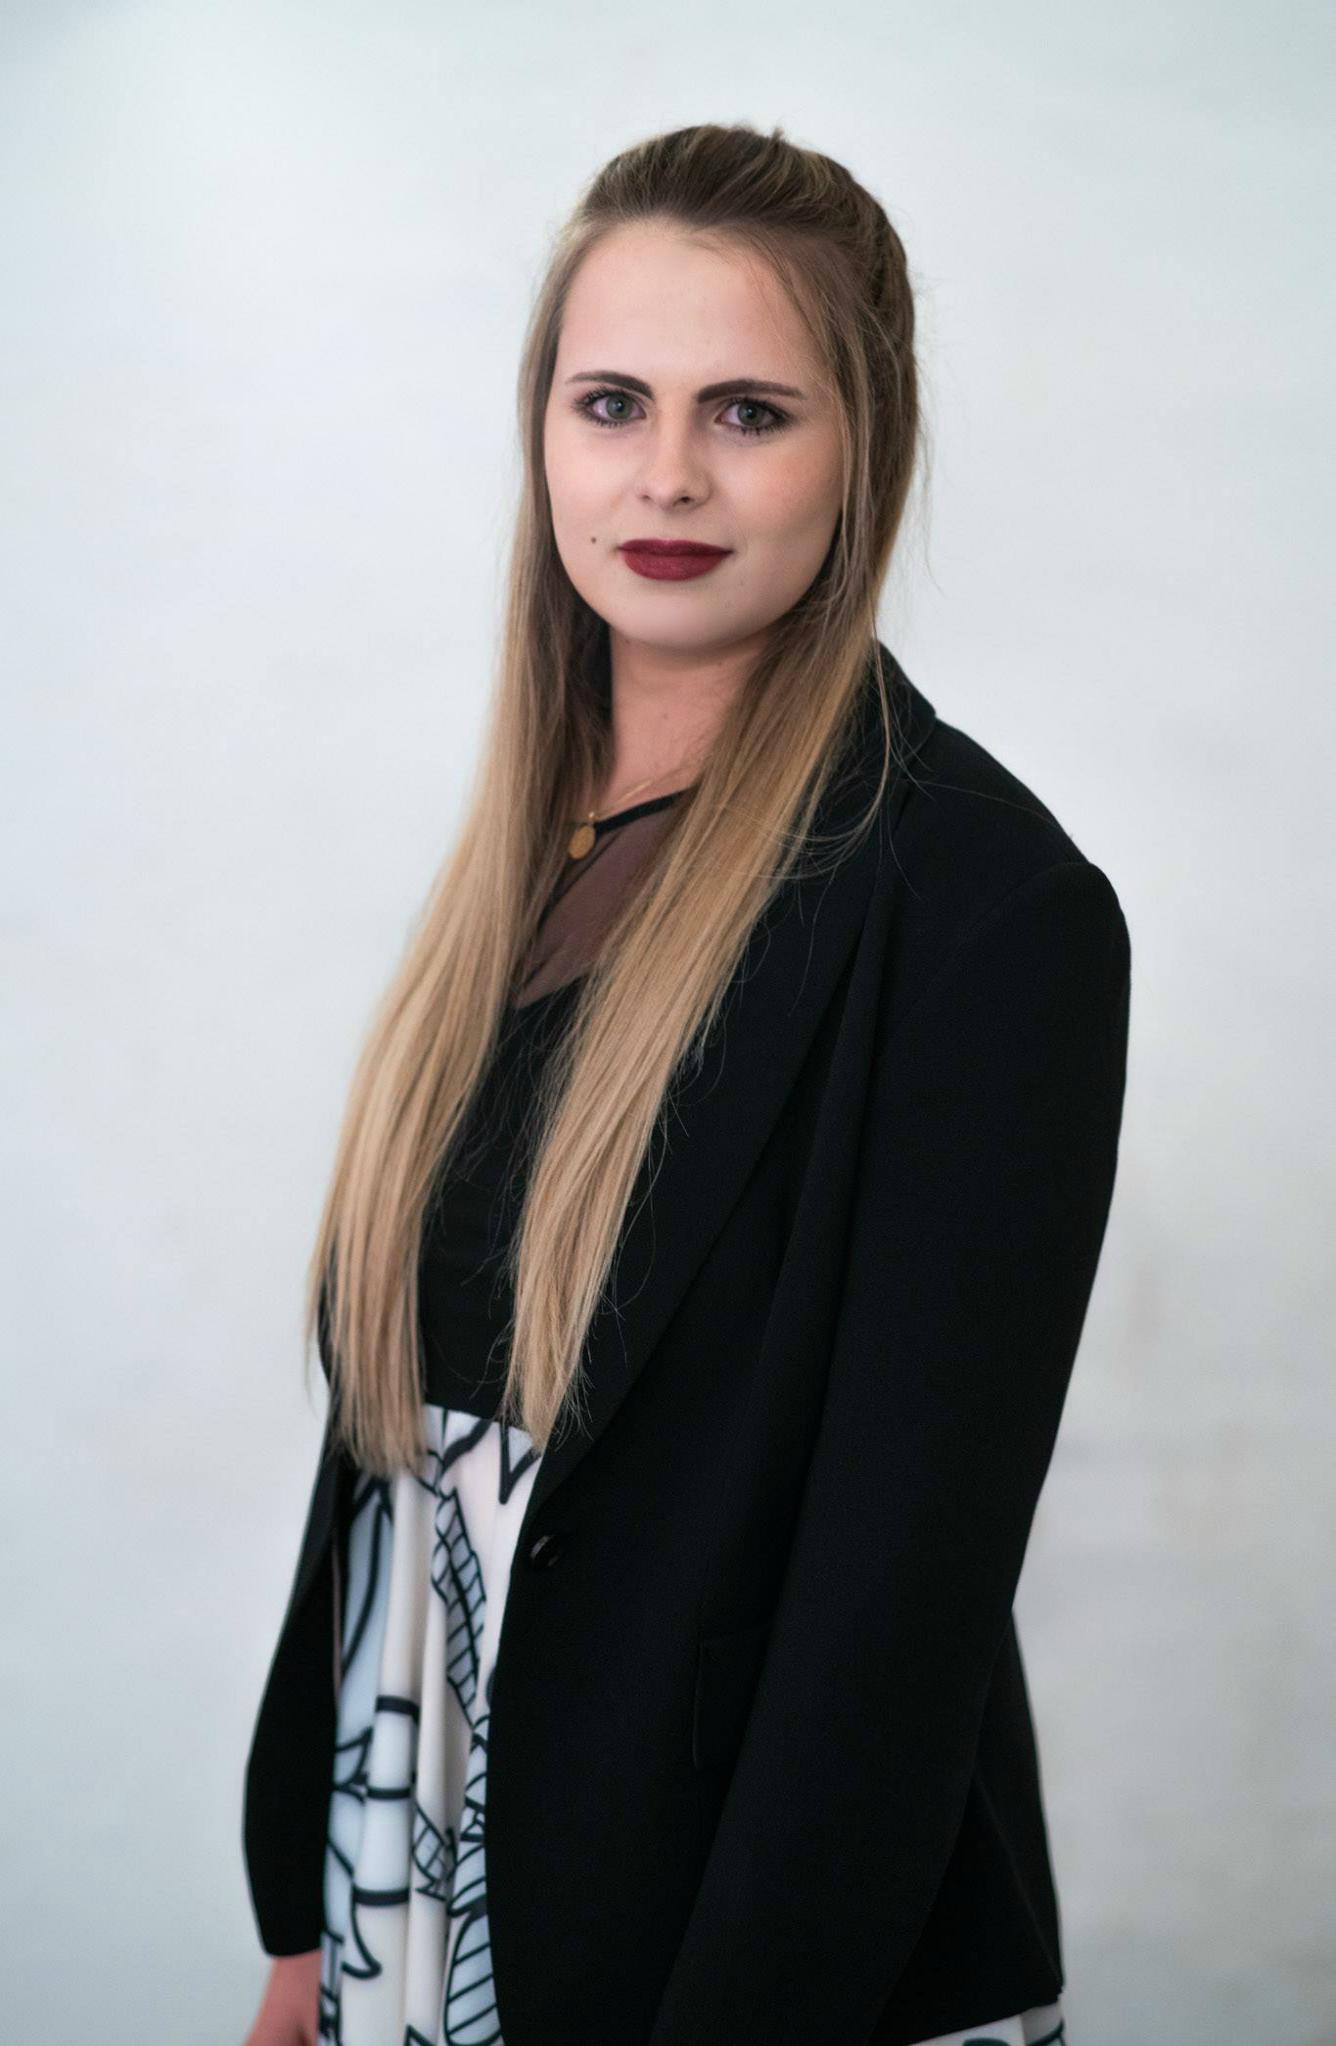 Antonella Gutbrod